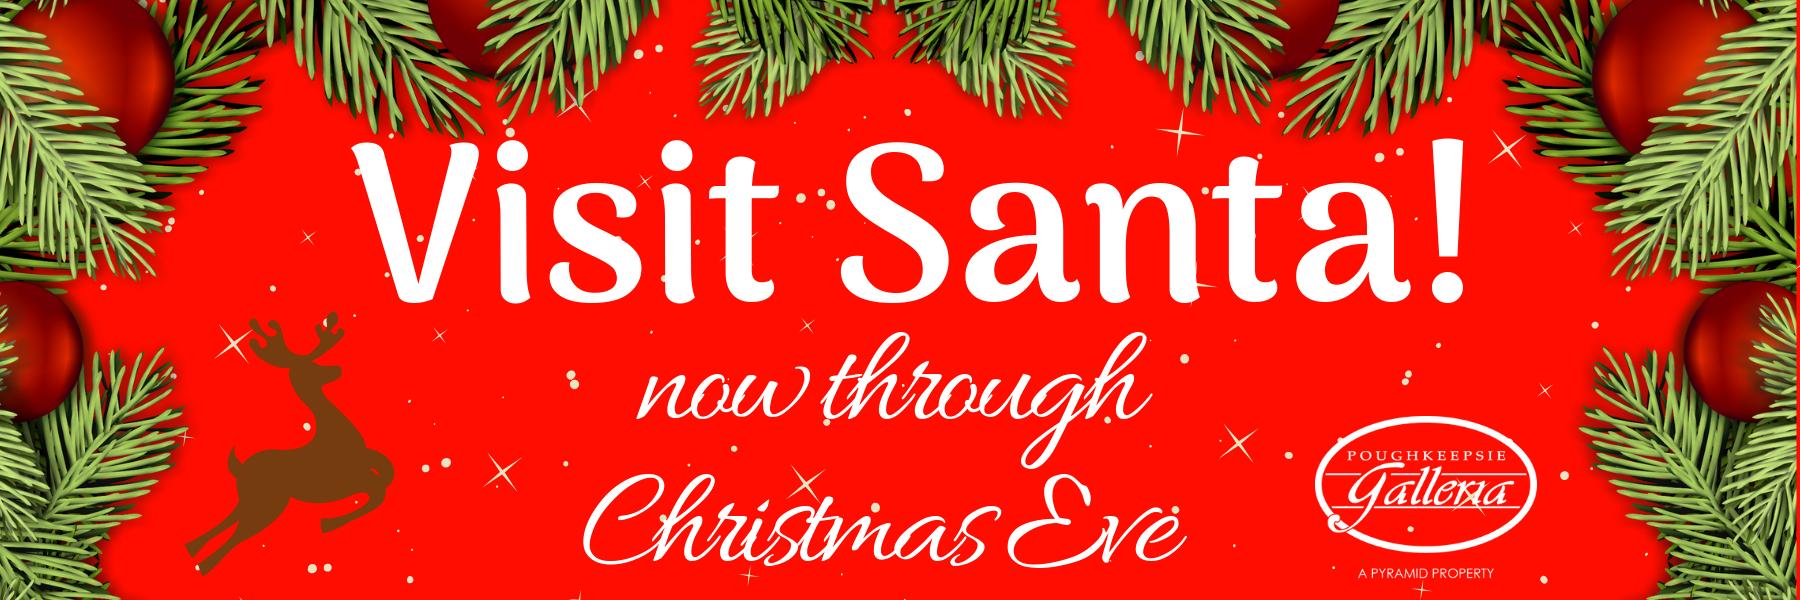 Visit Santa website